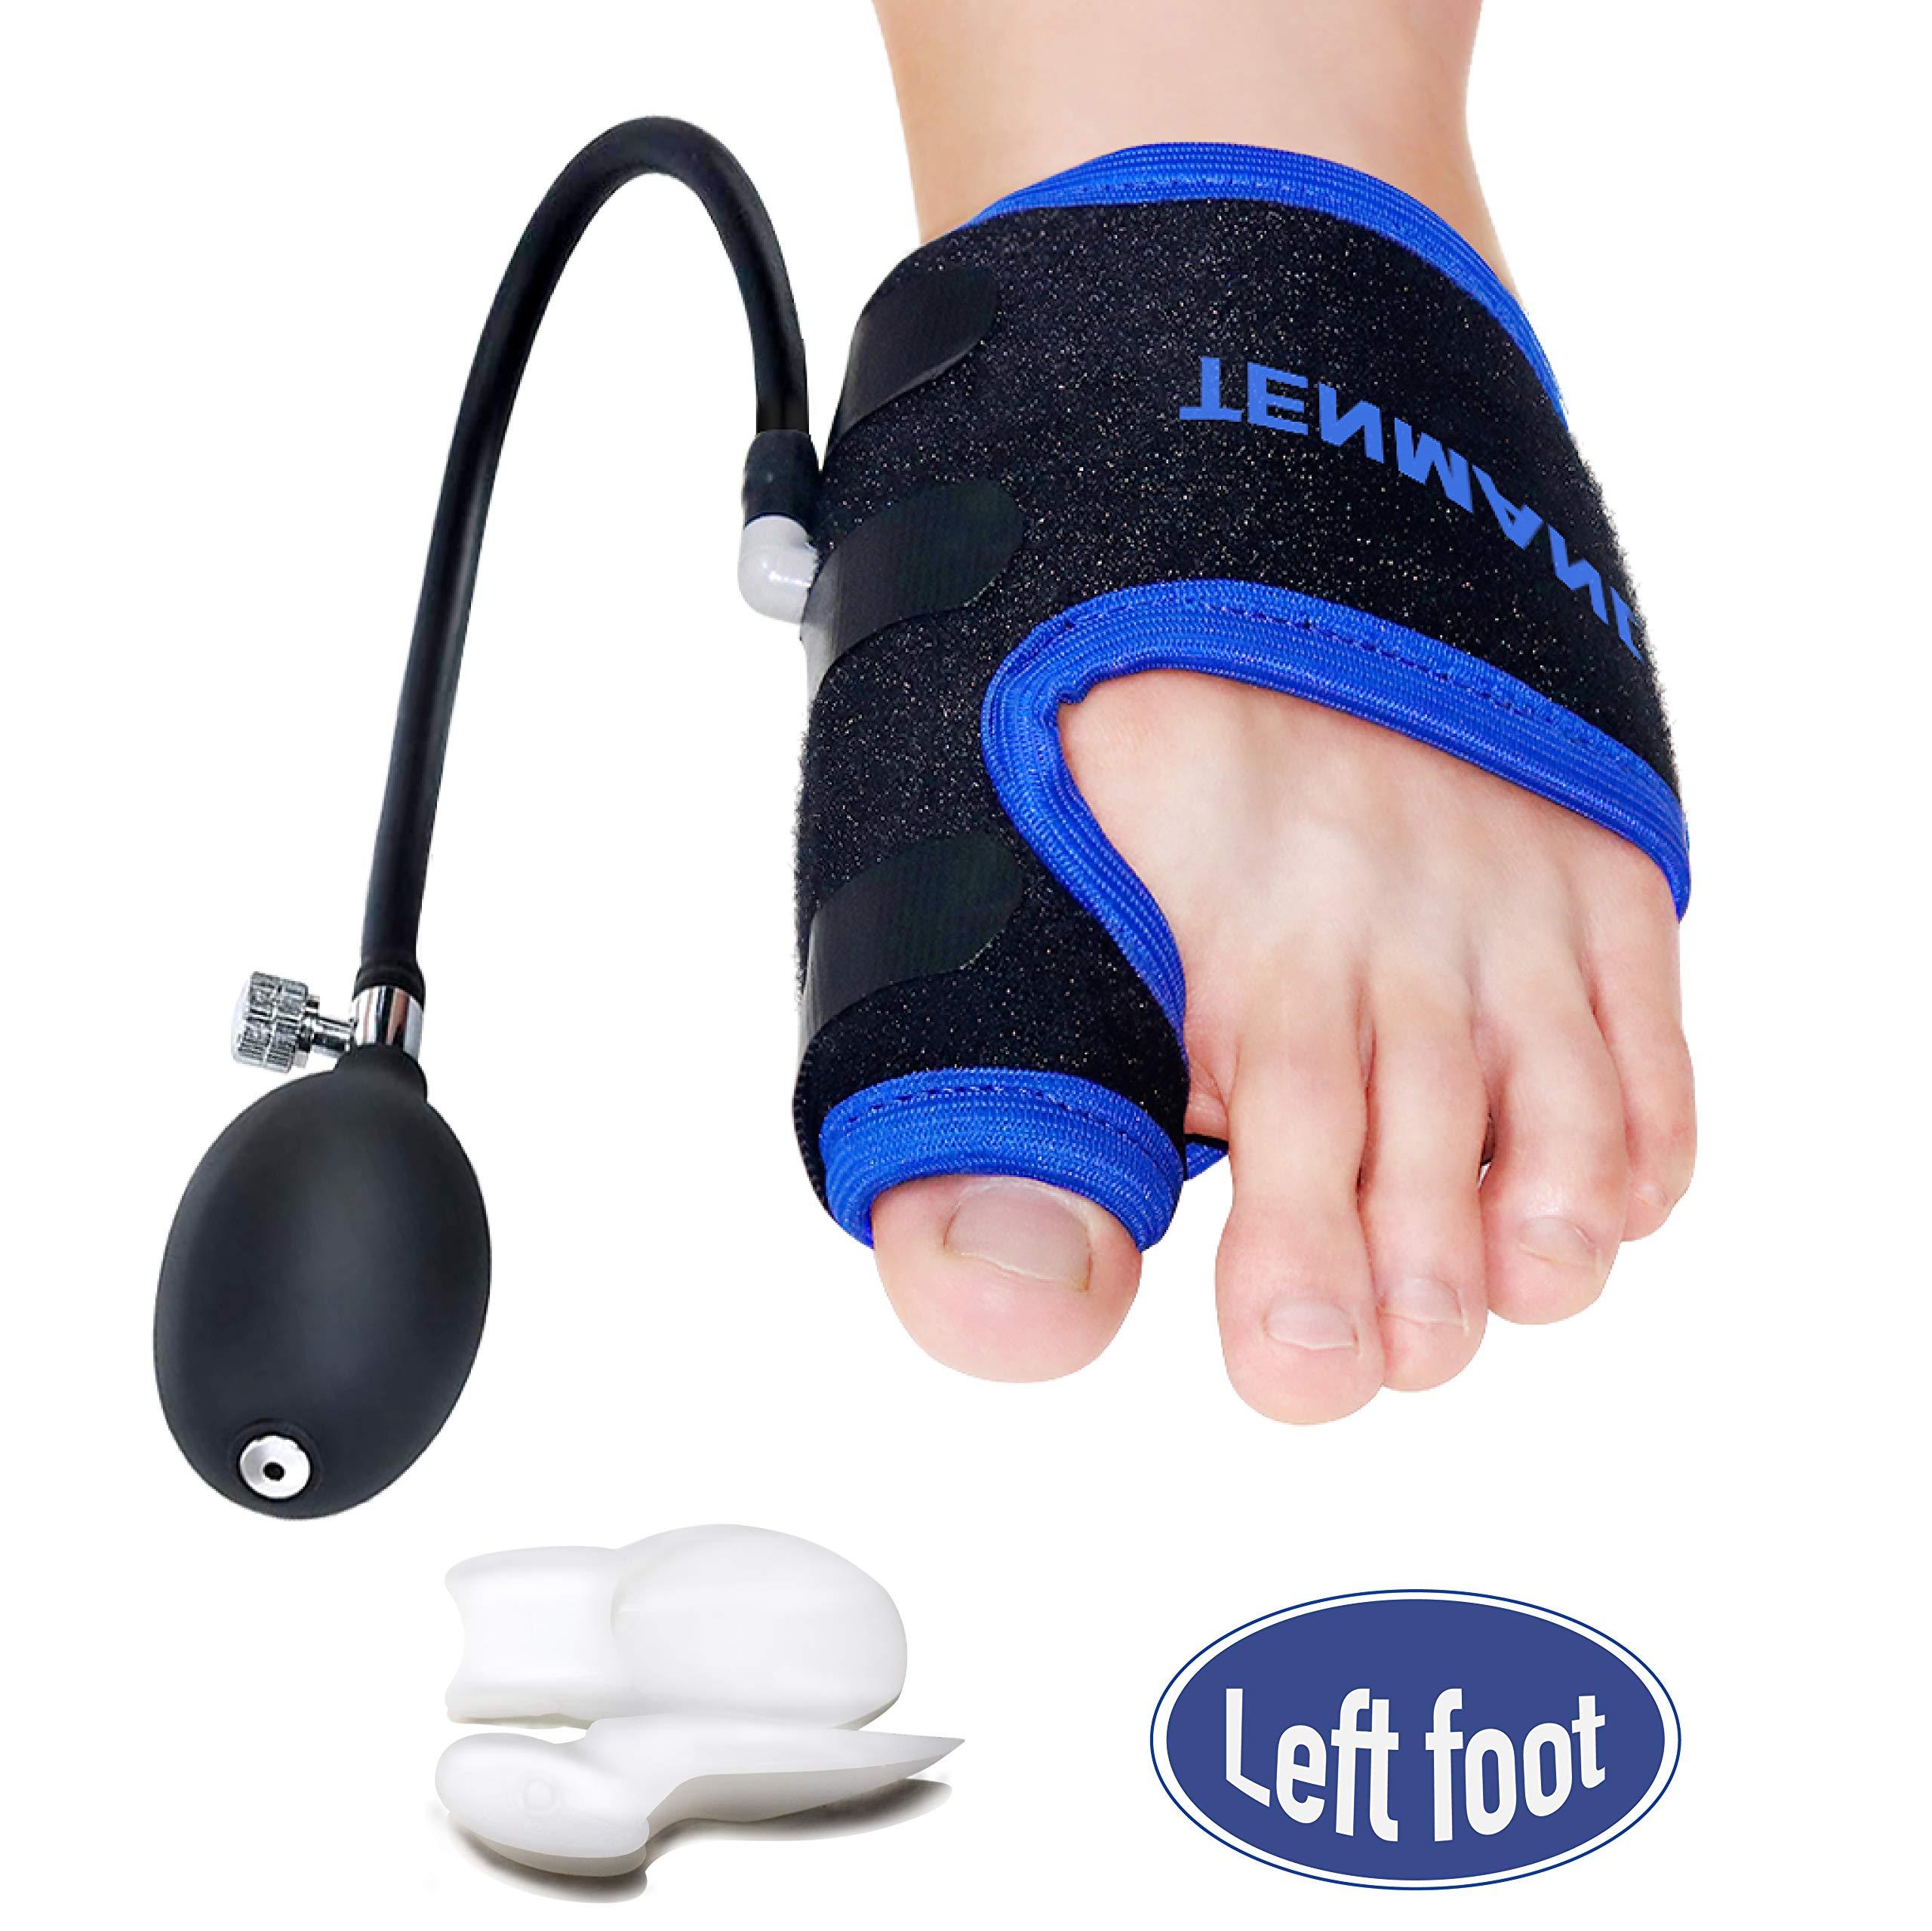 TENMAND Bunion Corrector and Toe Straightener & Adjustable Orthopedic Pneumatic Bunion Splints Relief Hallux Valgus Bunion Pain with Splint Aid Treatment for Women and Men (Left Foot)